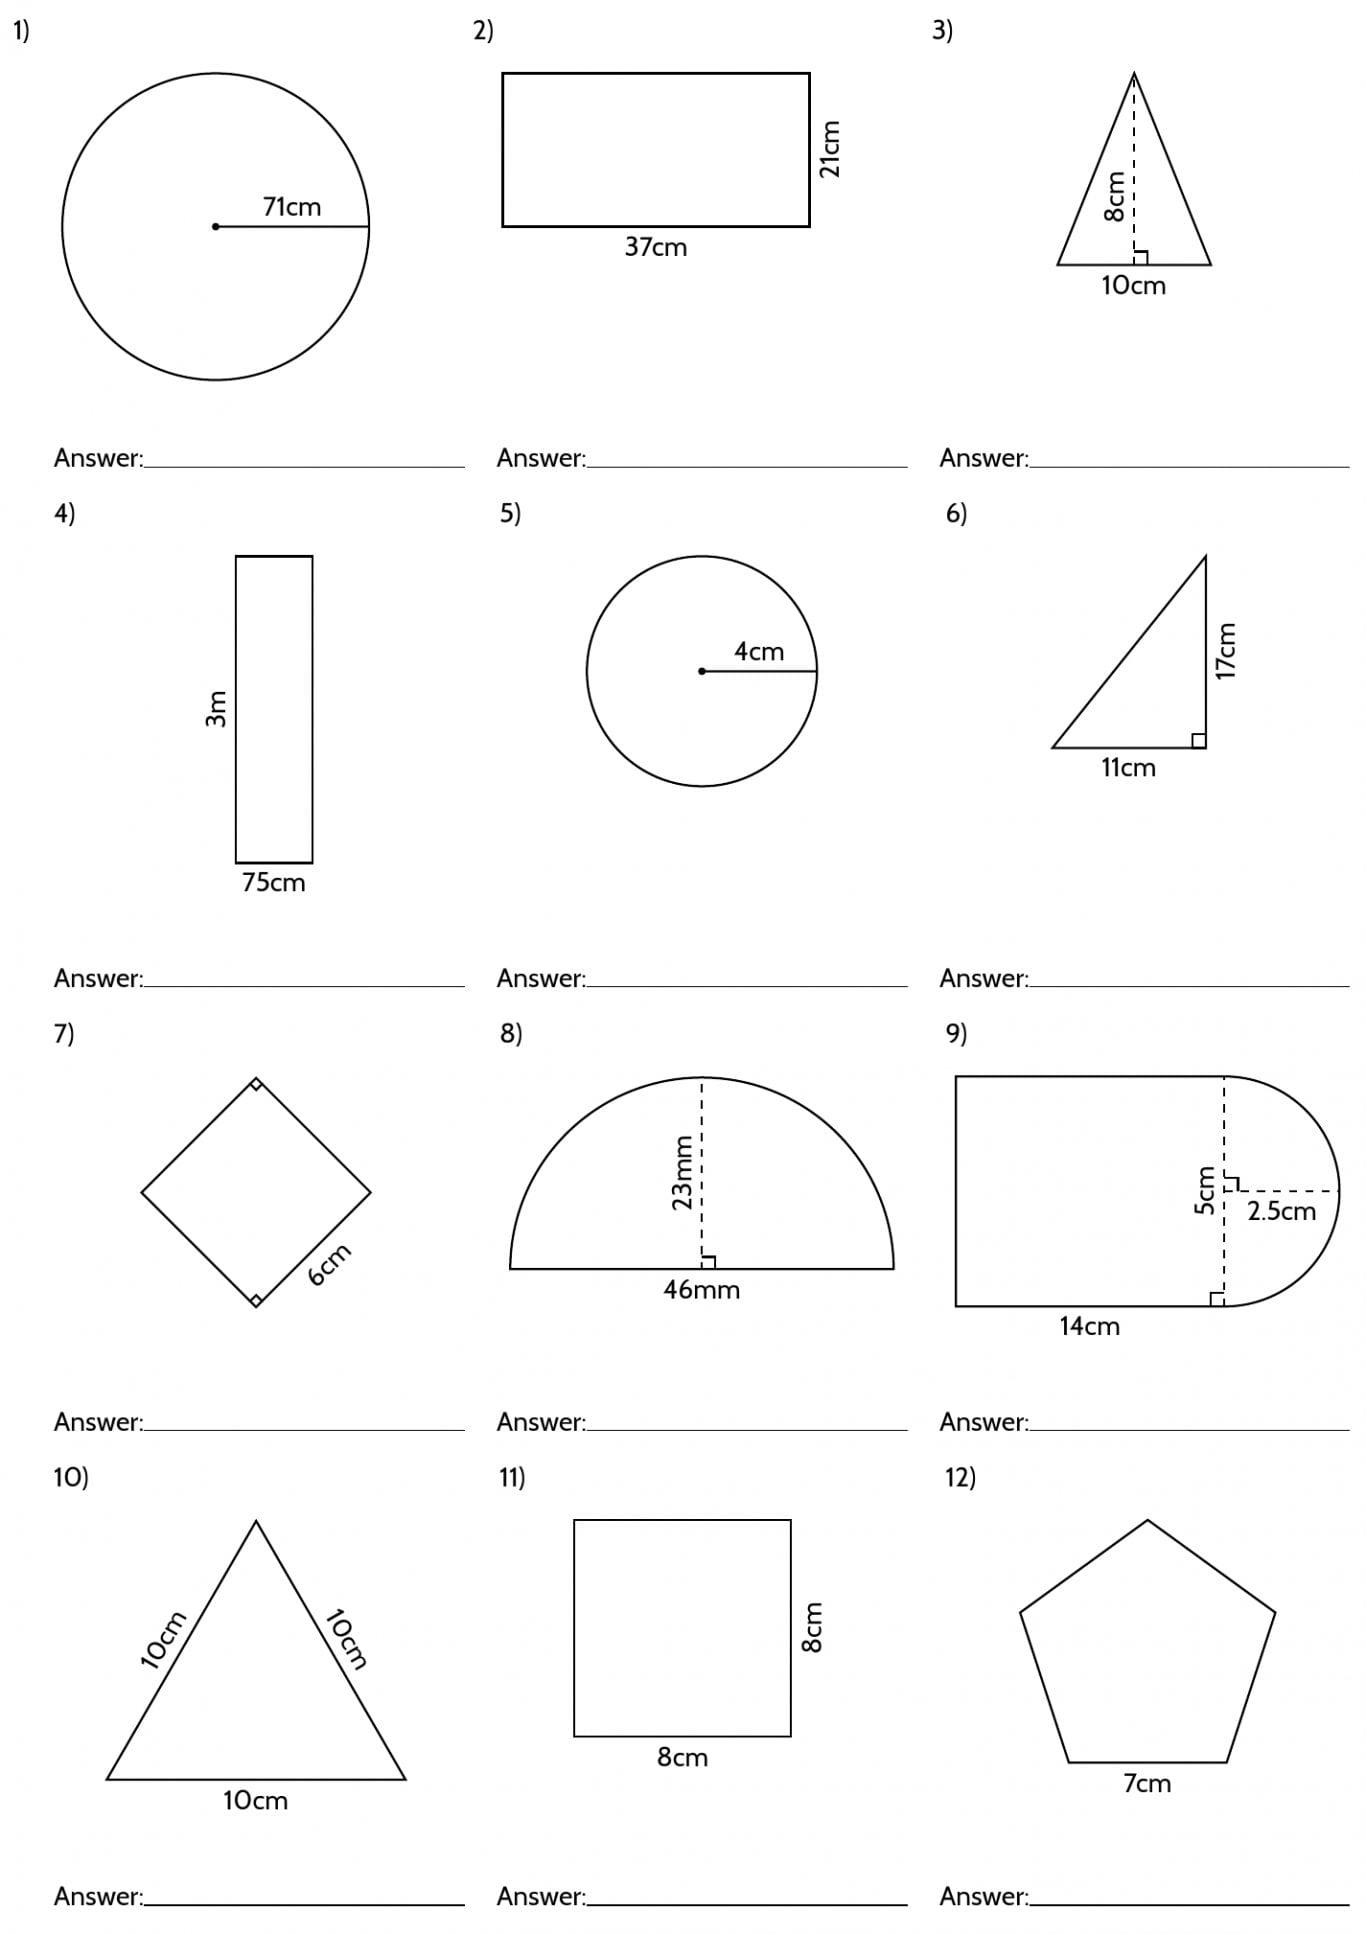 Sixth Grade Geometry Worksheets Free  Justswimfl Regarding 8Th Grade Geometry Worksheets